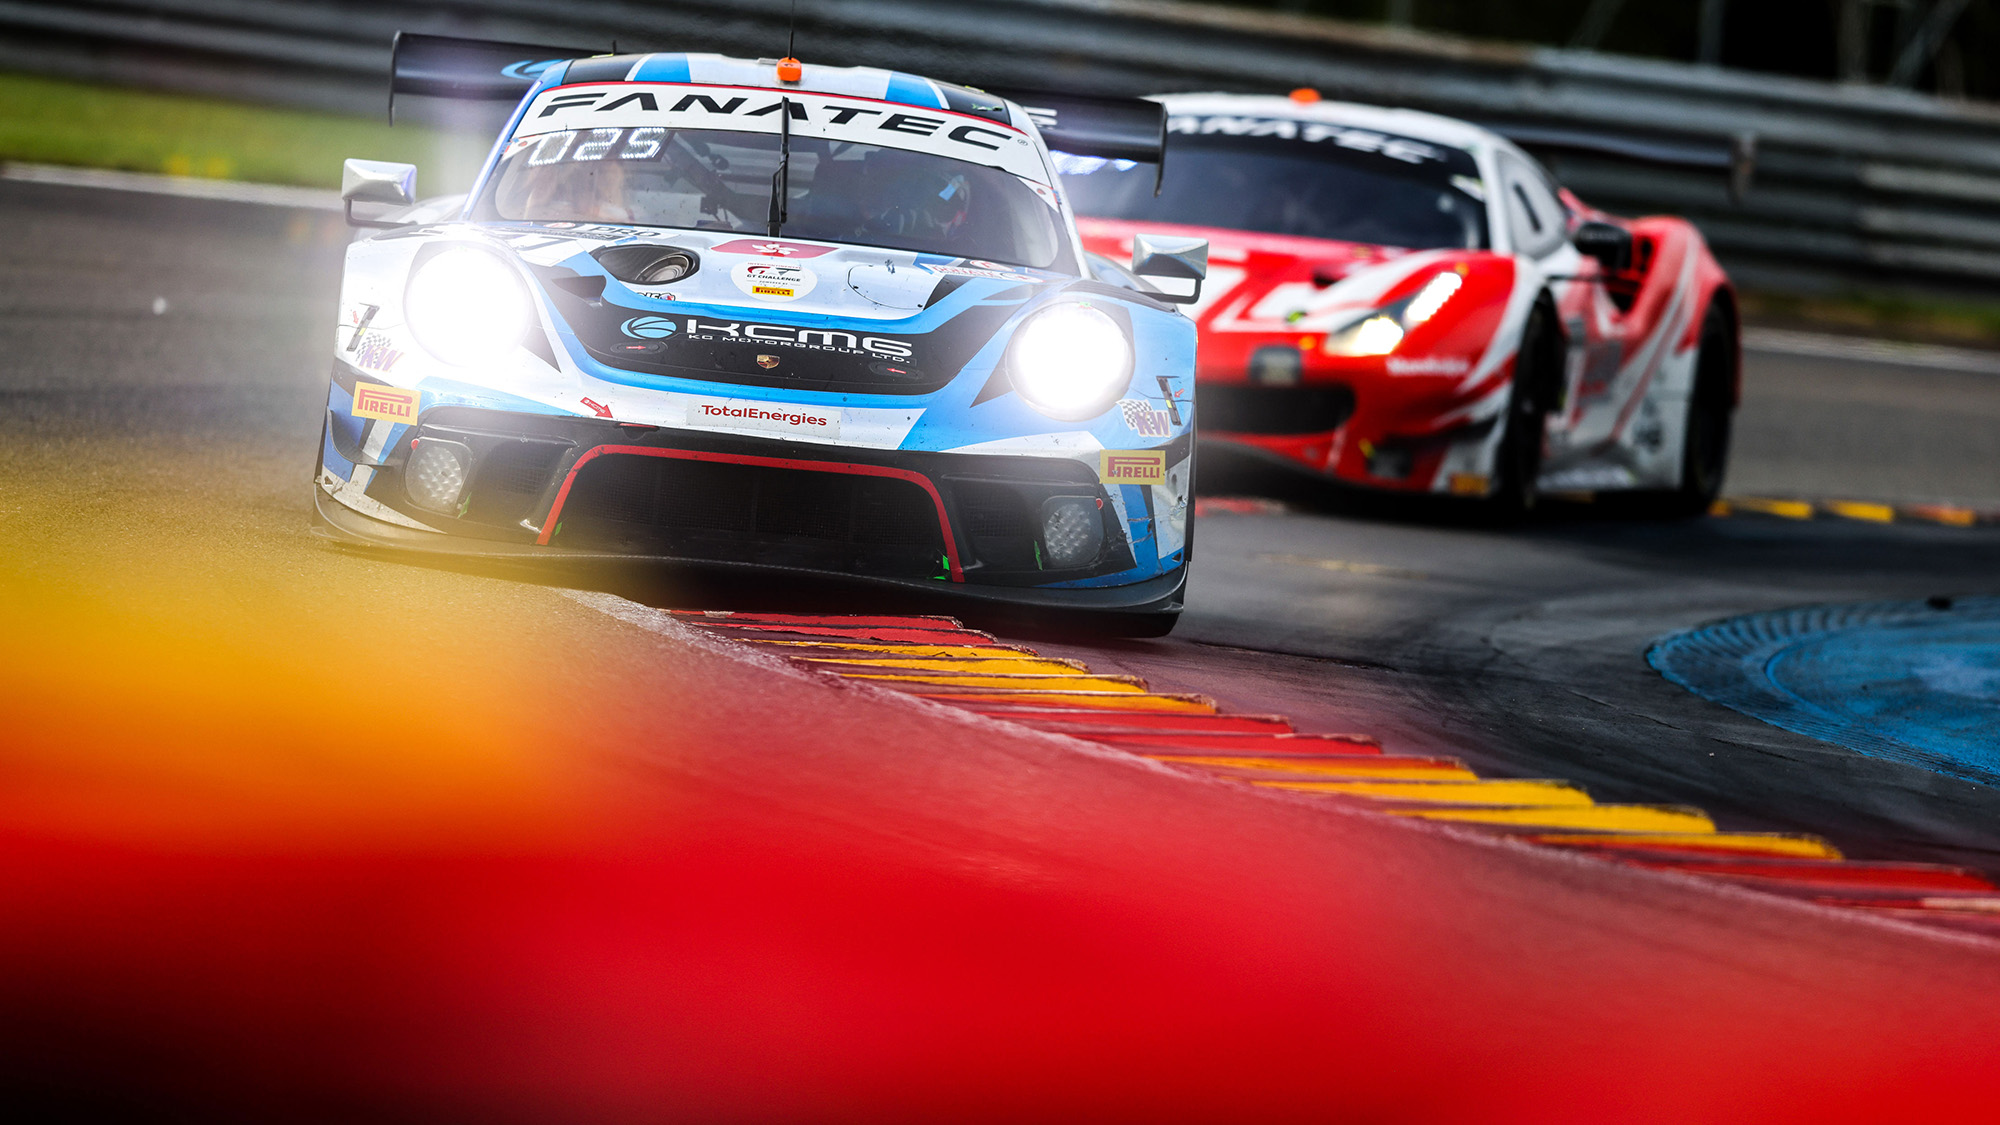 Porsche and Ferrari GT3 cars at Spa 24h 2021